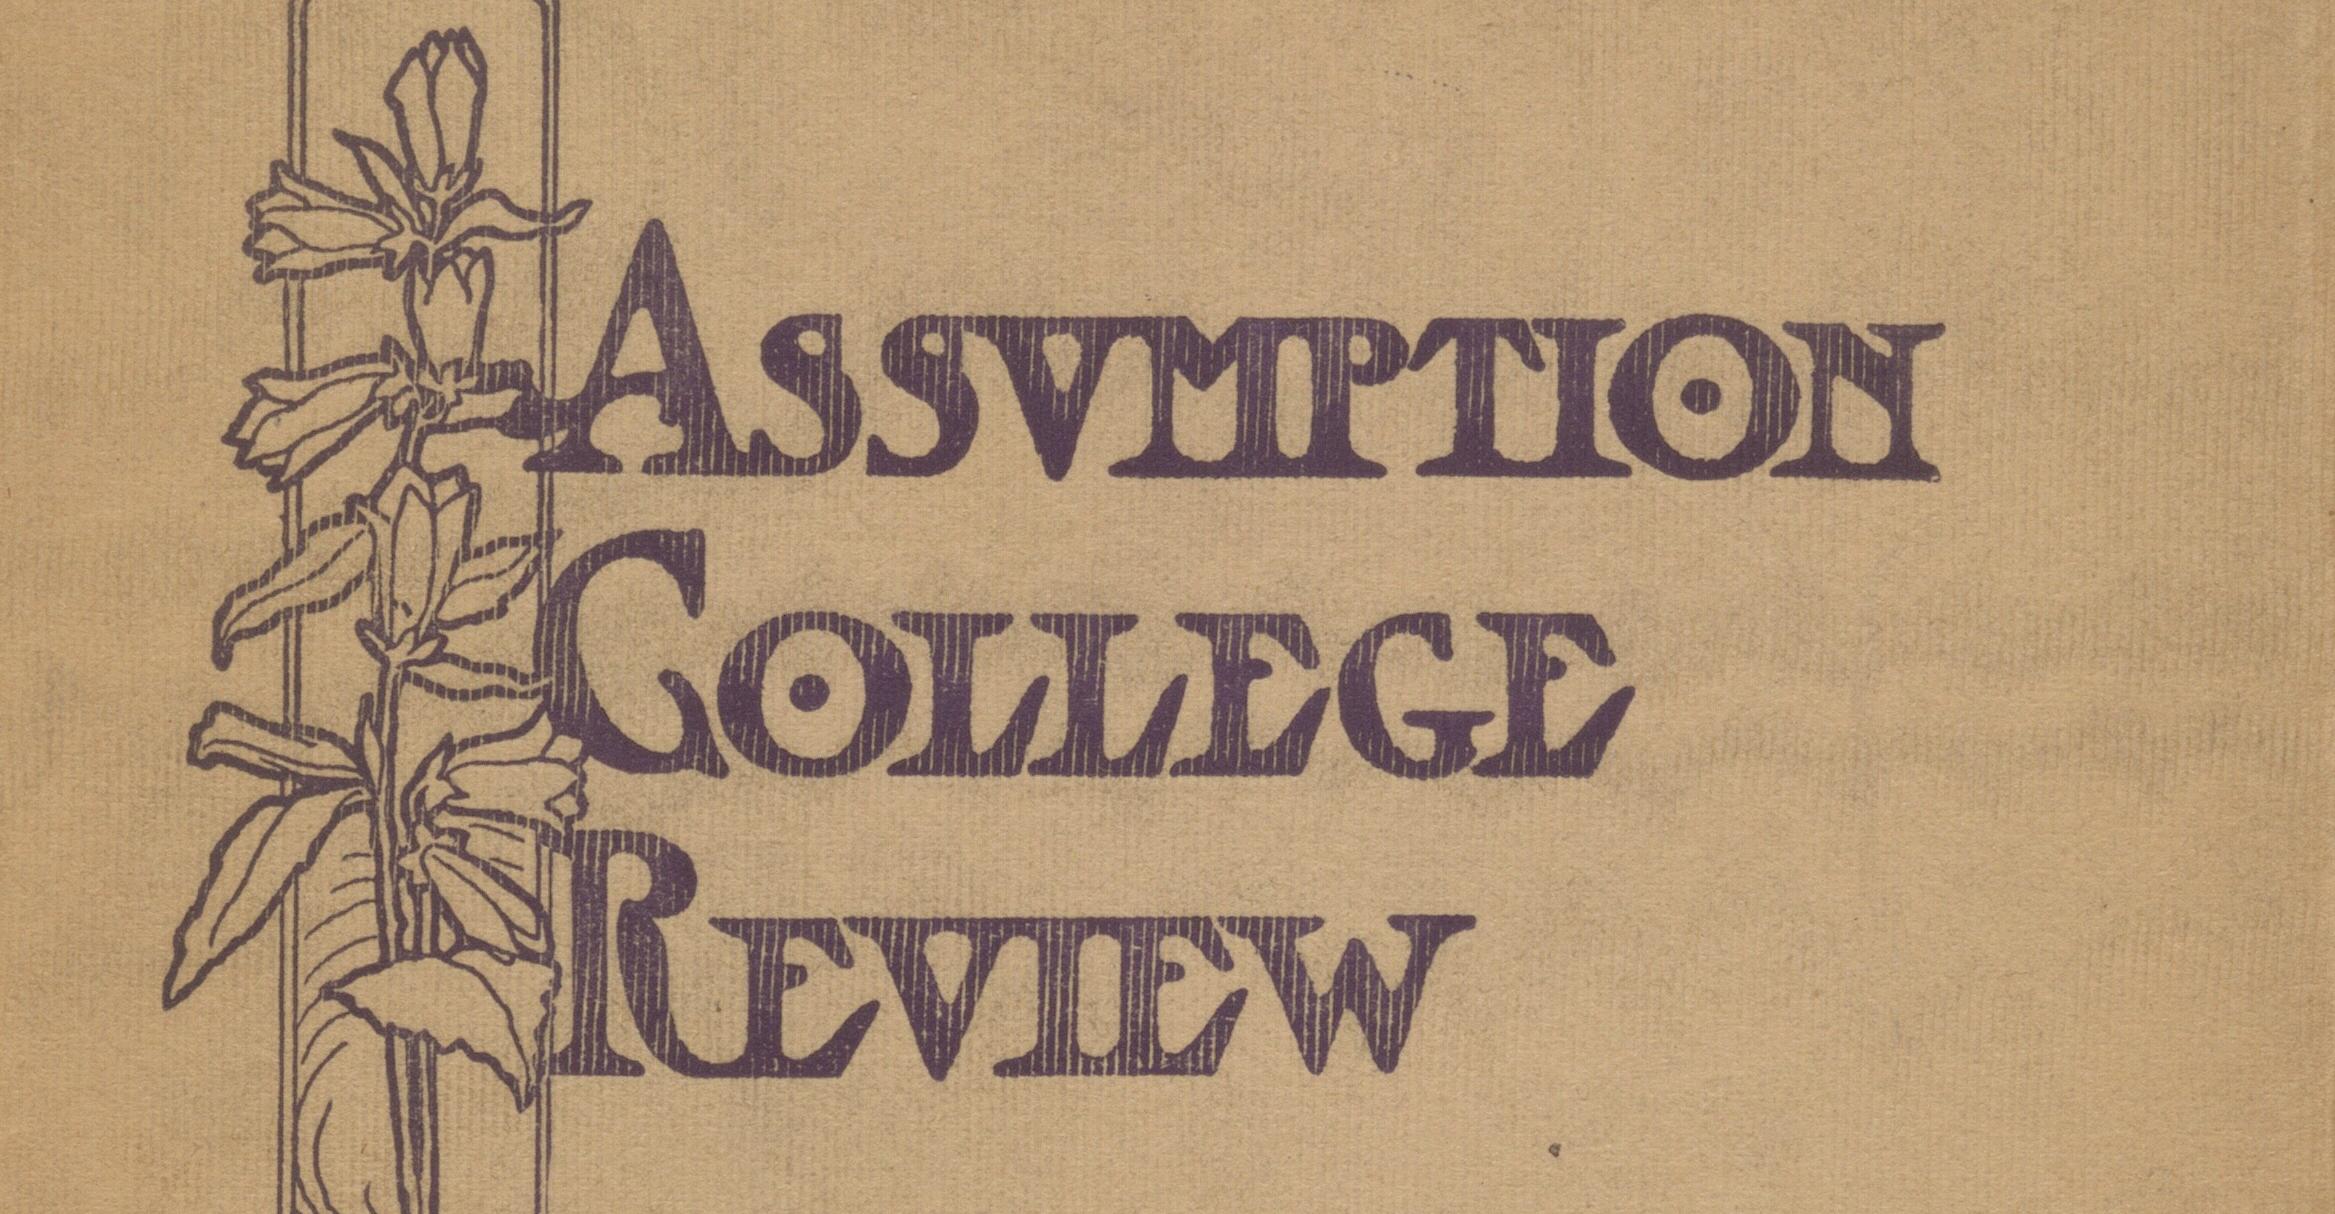 Assumption College Review